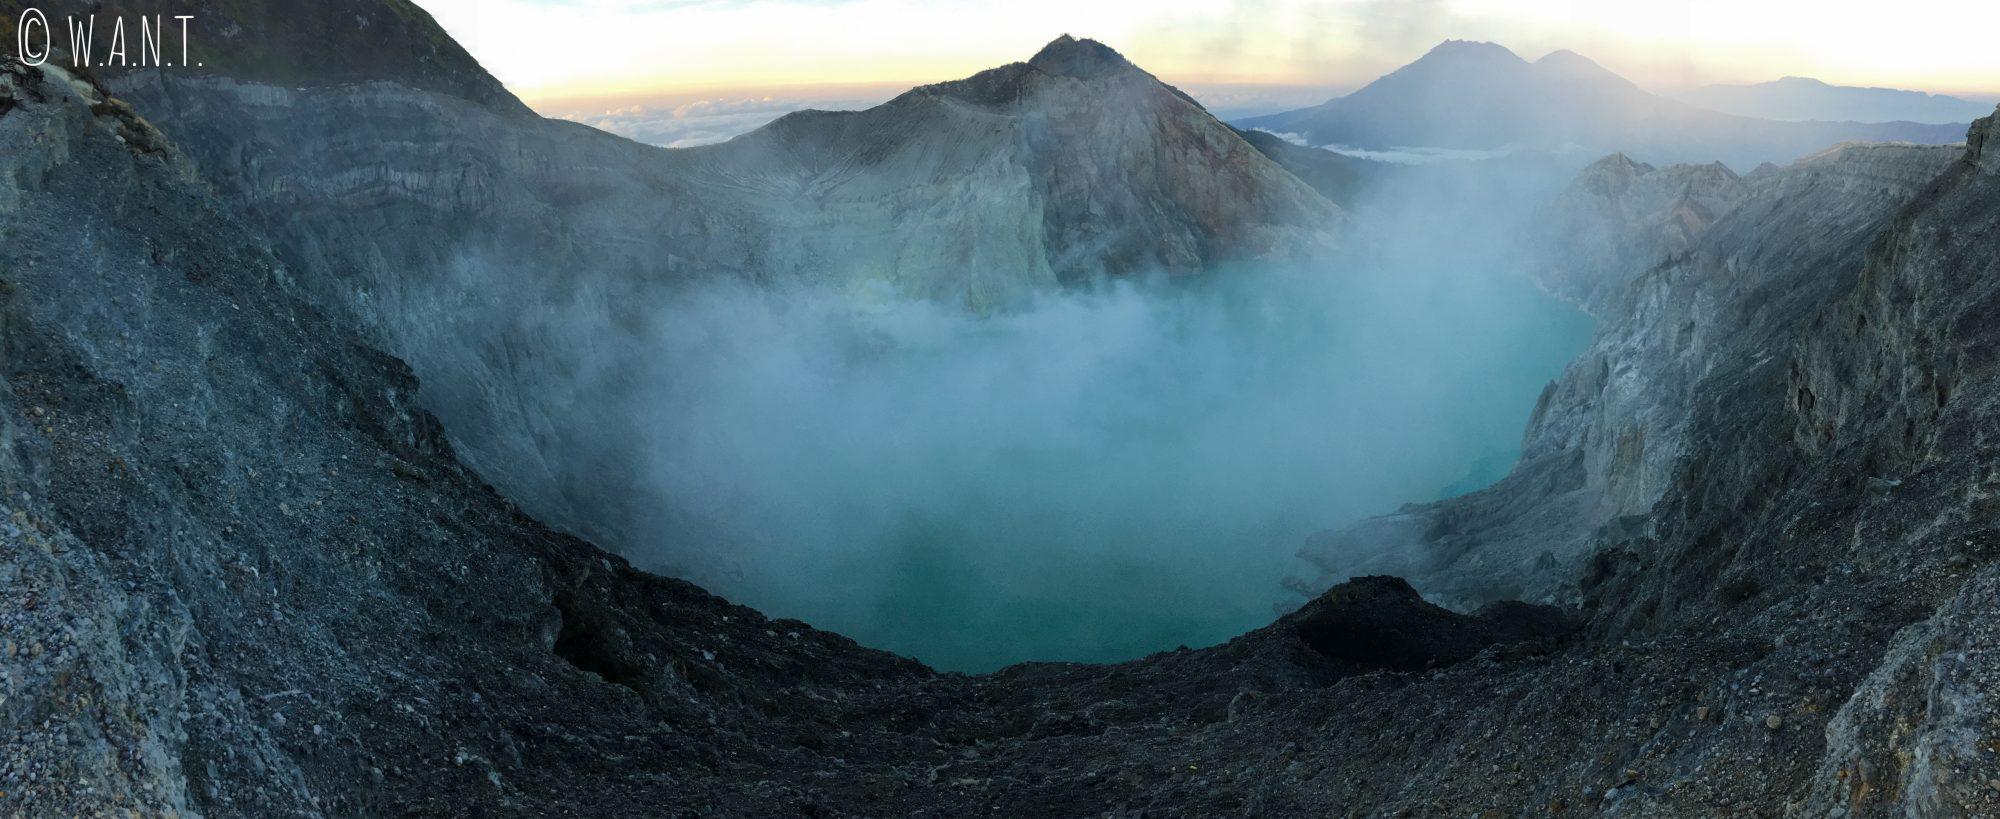 Panorama du cratère fumant du Kawah Ijen